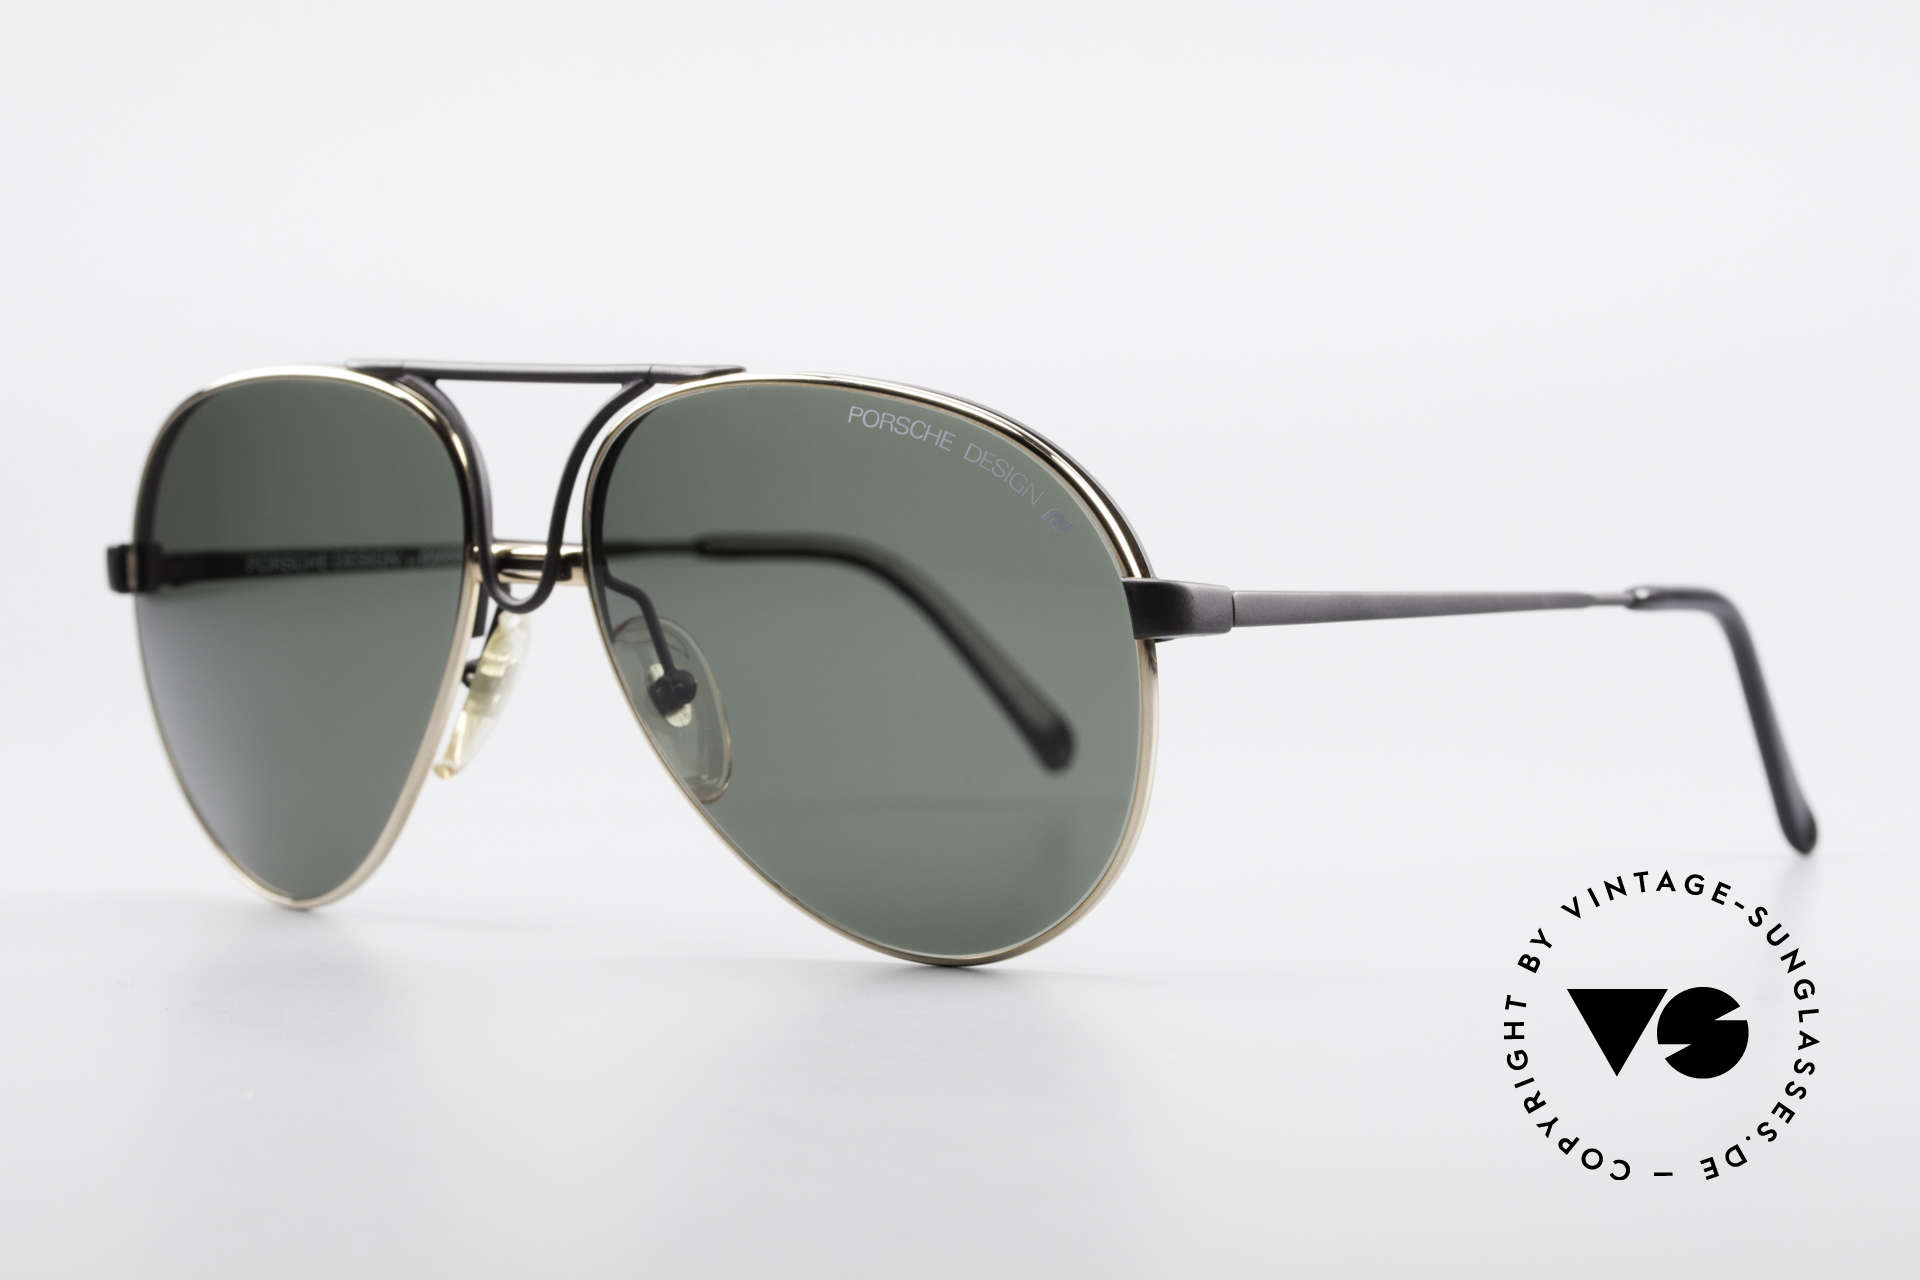 Porsche 5657 Interchangeable Frame 90's, 1 x black with demos & 1 x gold with sun lenses, Made for Men